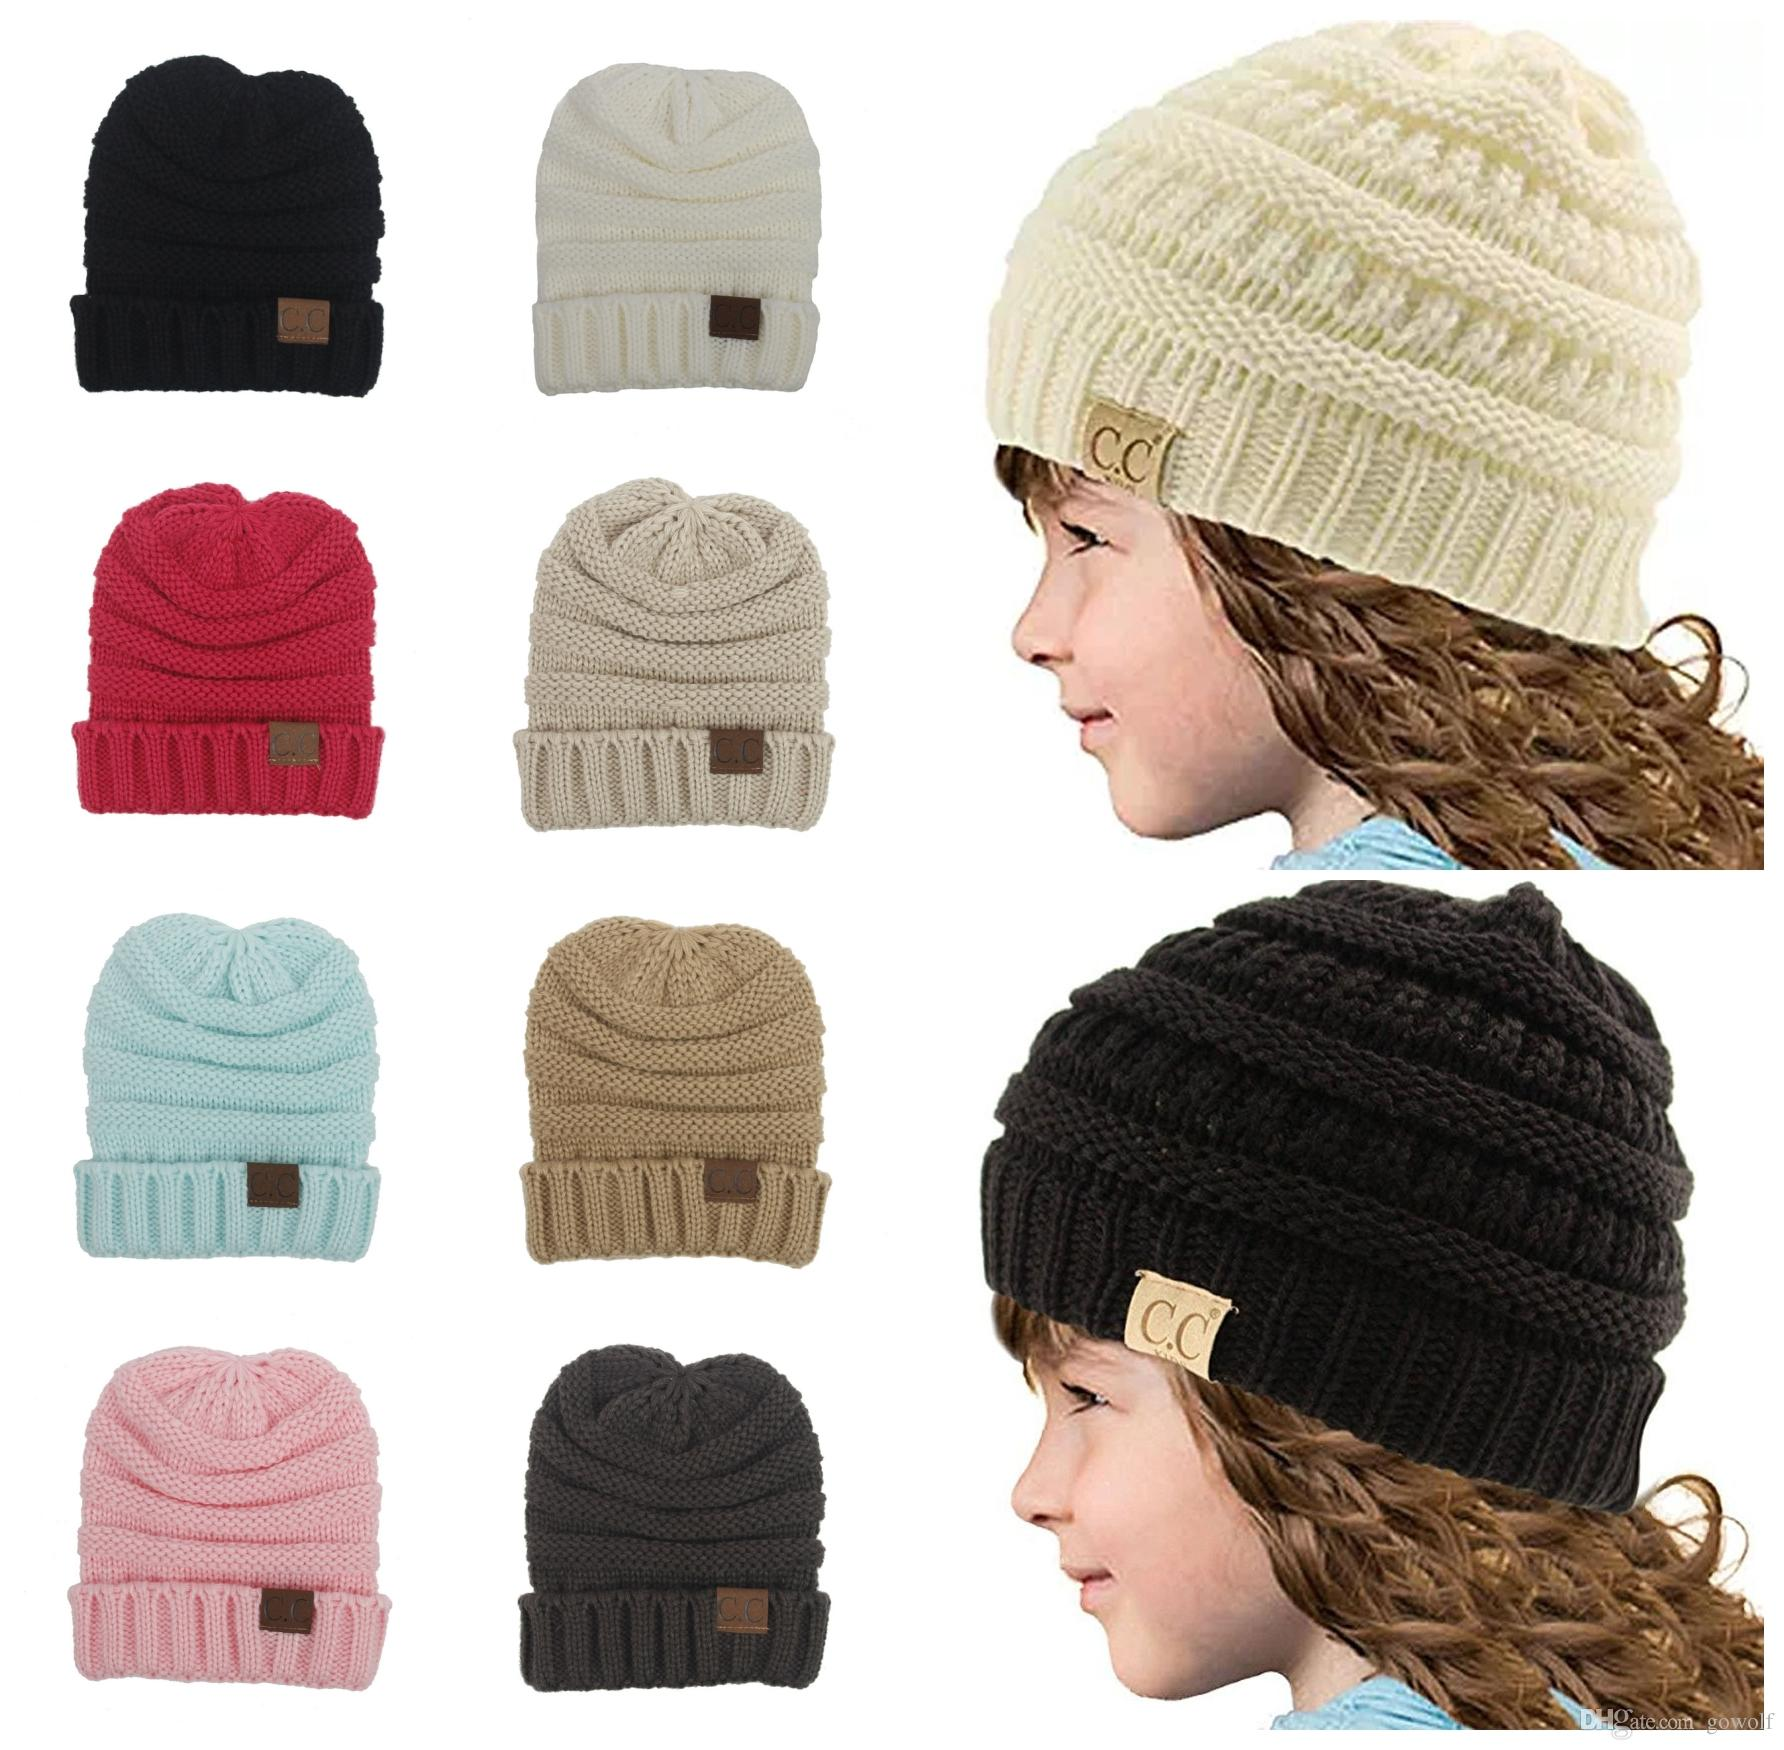 1d7b612d246524 CC Beanie Hats Winter Warm Headware Newborn Baby Kids Girls Boys ...